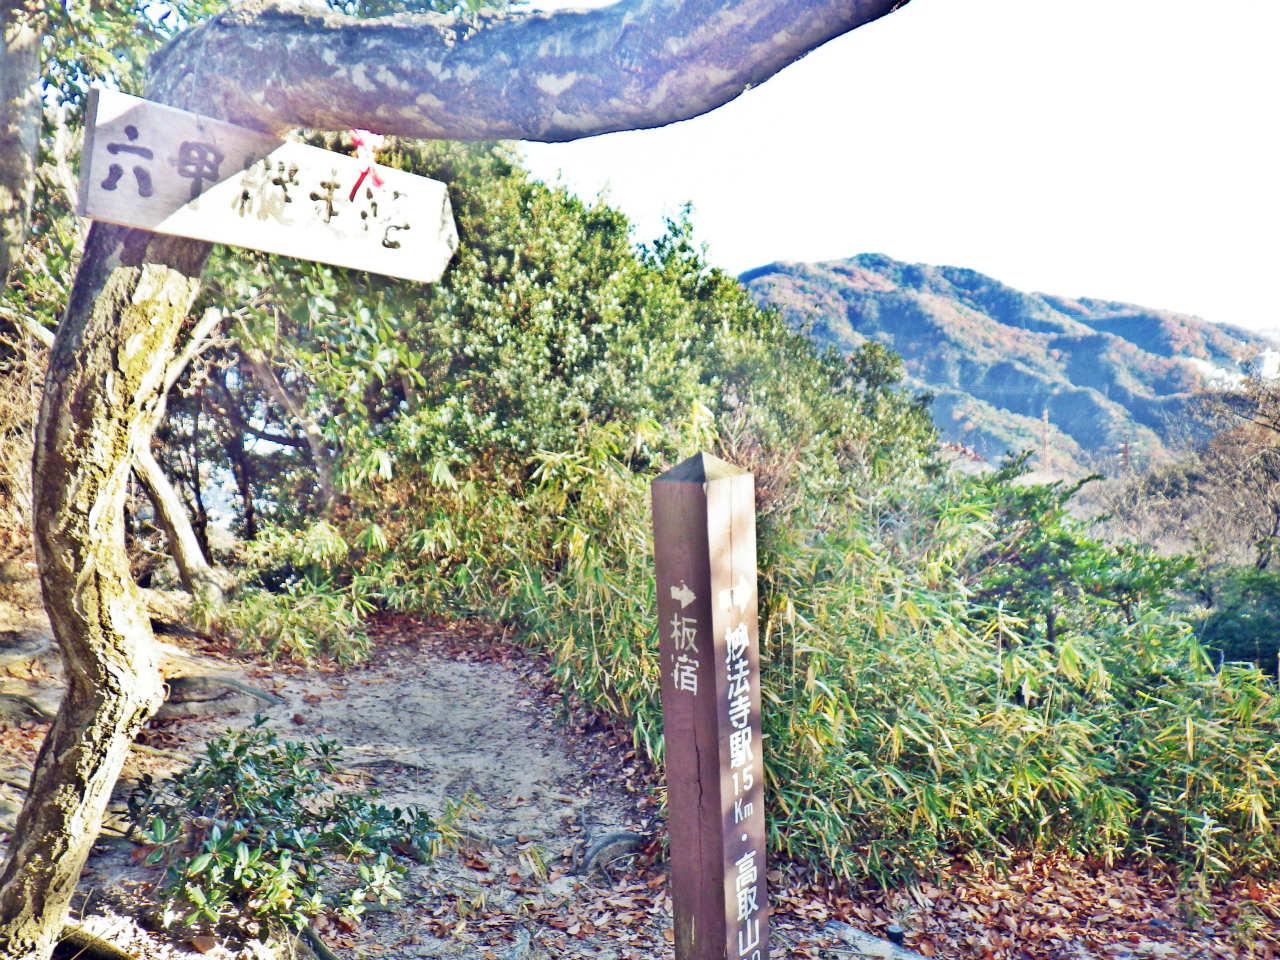 05b 六甲縦走路の標識